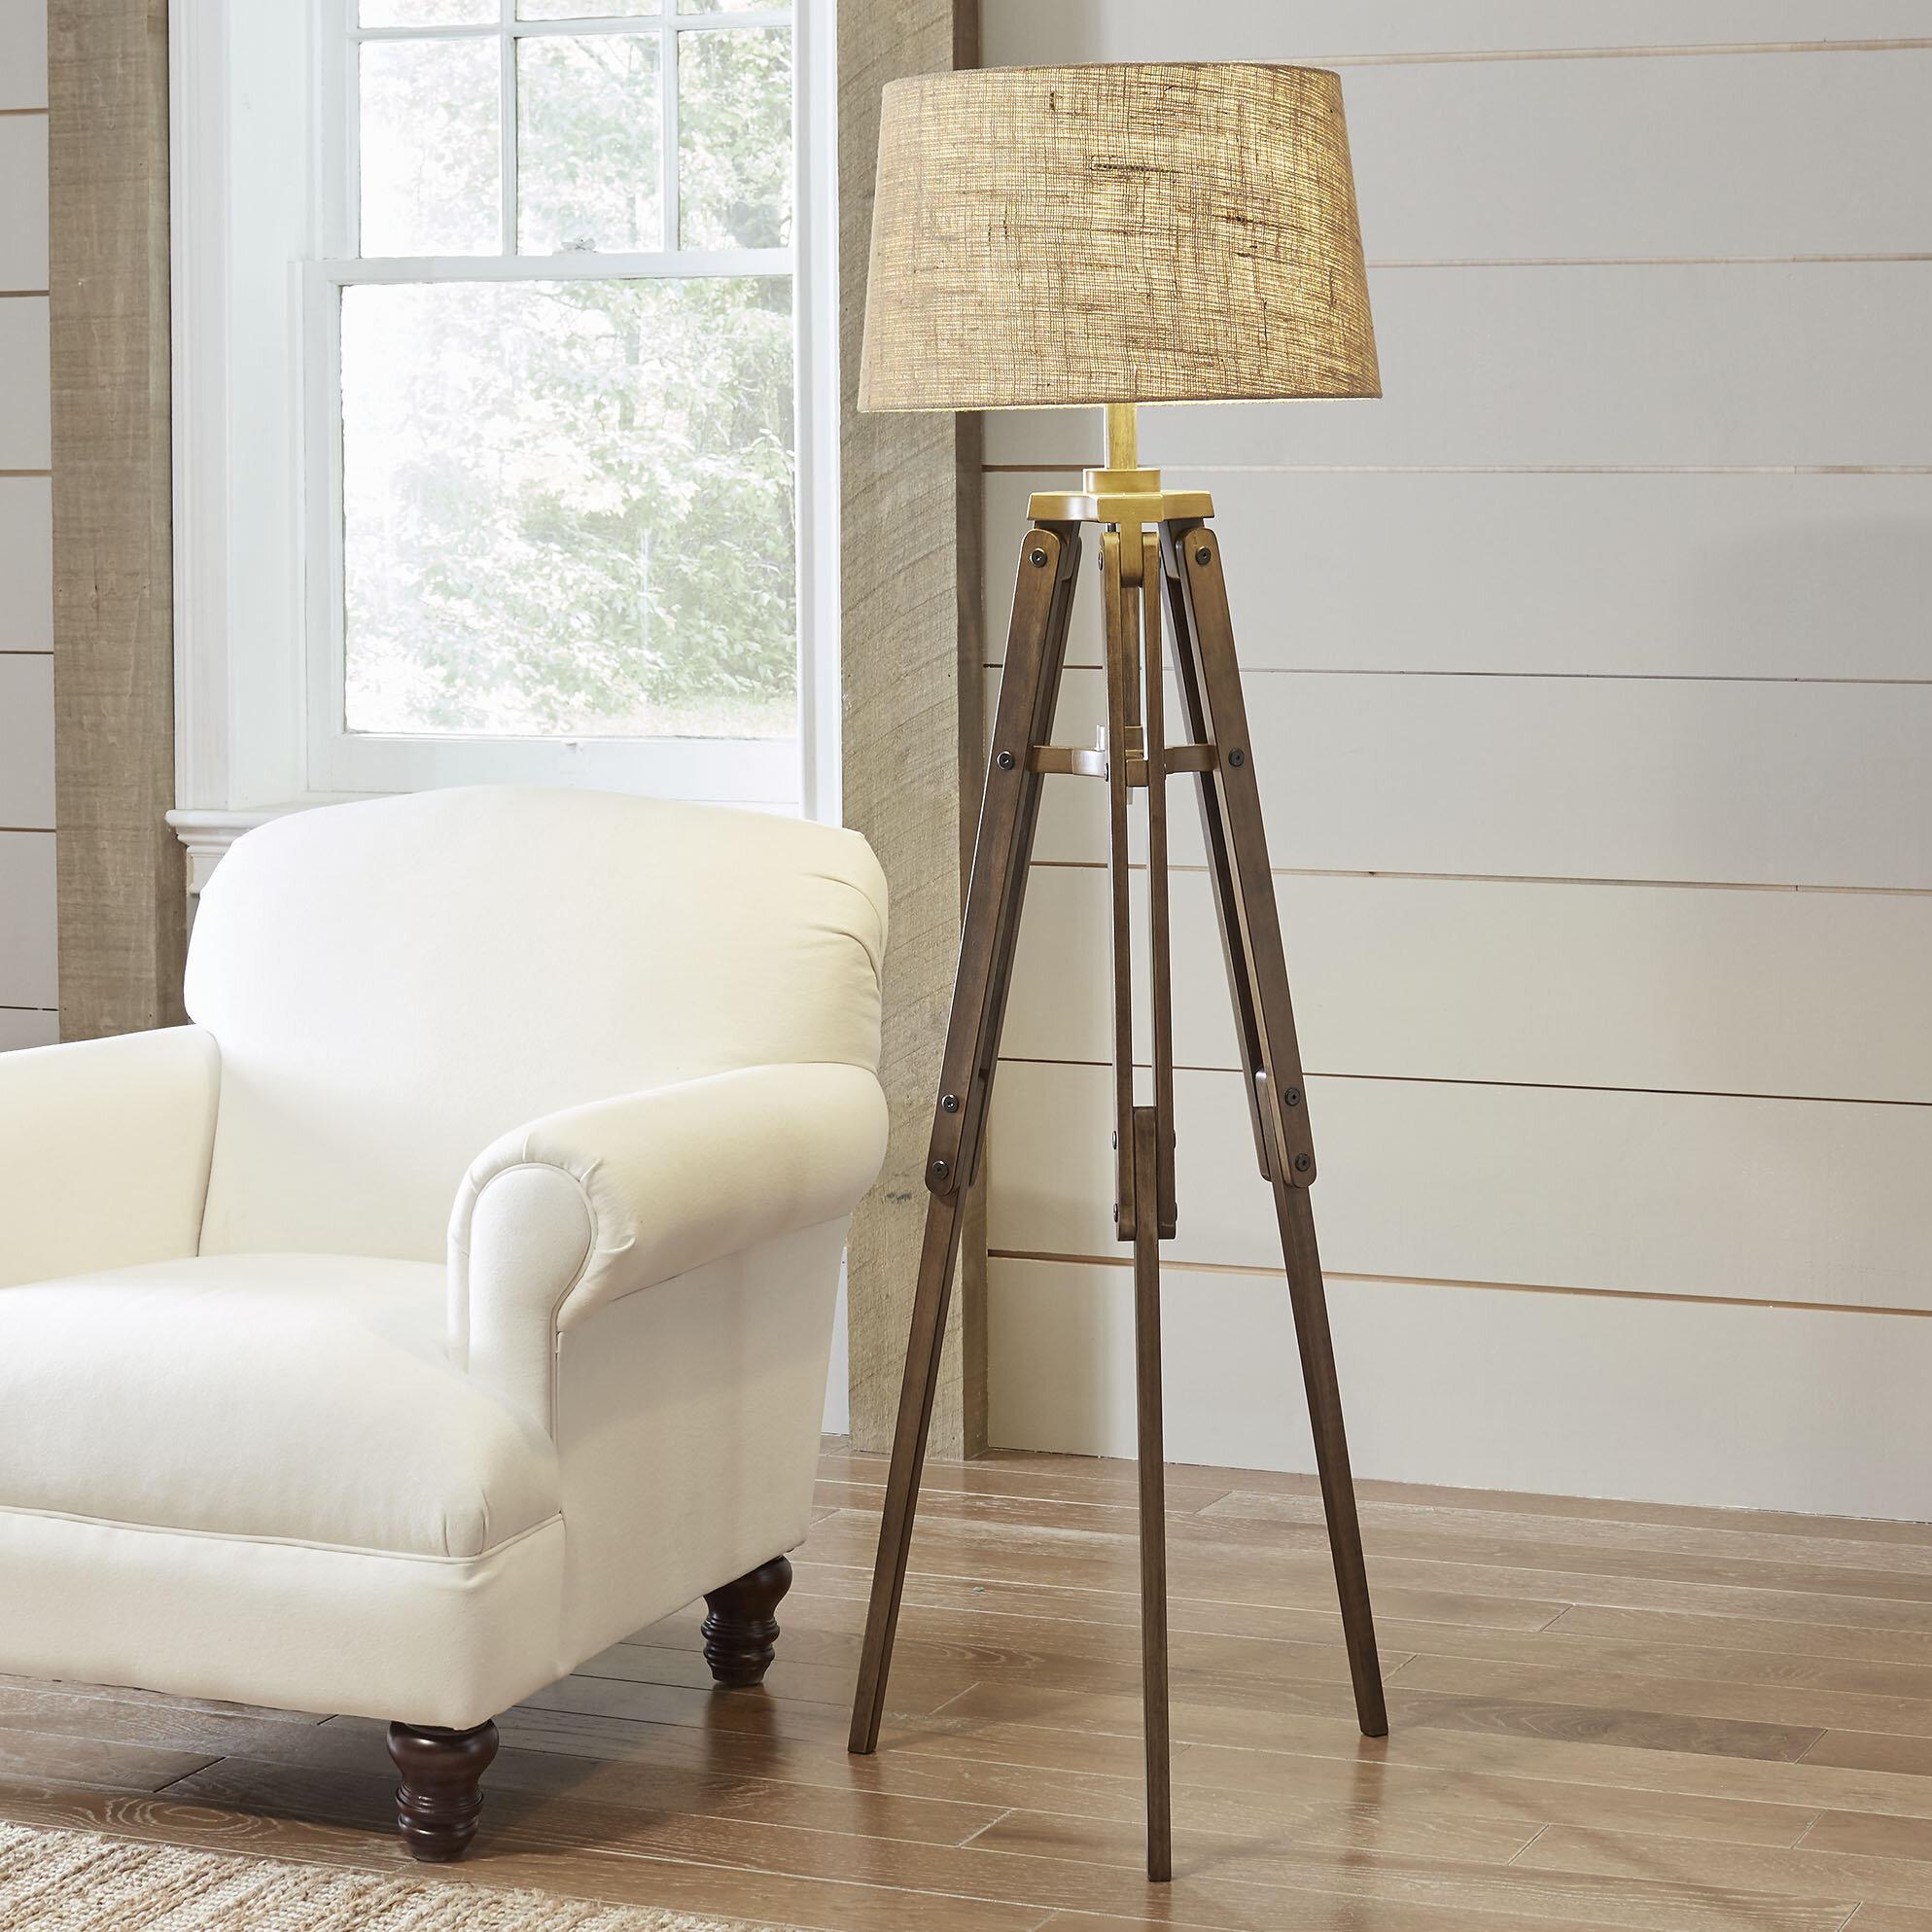 Astonishing Sorrento 62 25 Tripod Floor Lamp Theyellowbook Wood Chair Design Ideas Theyellowbookinfo